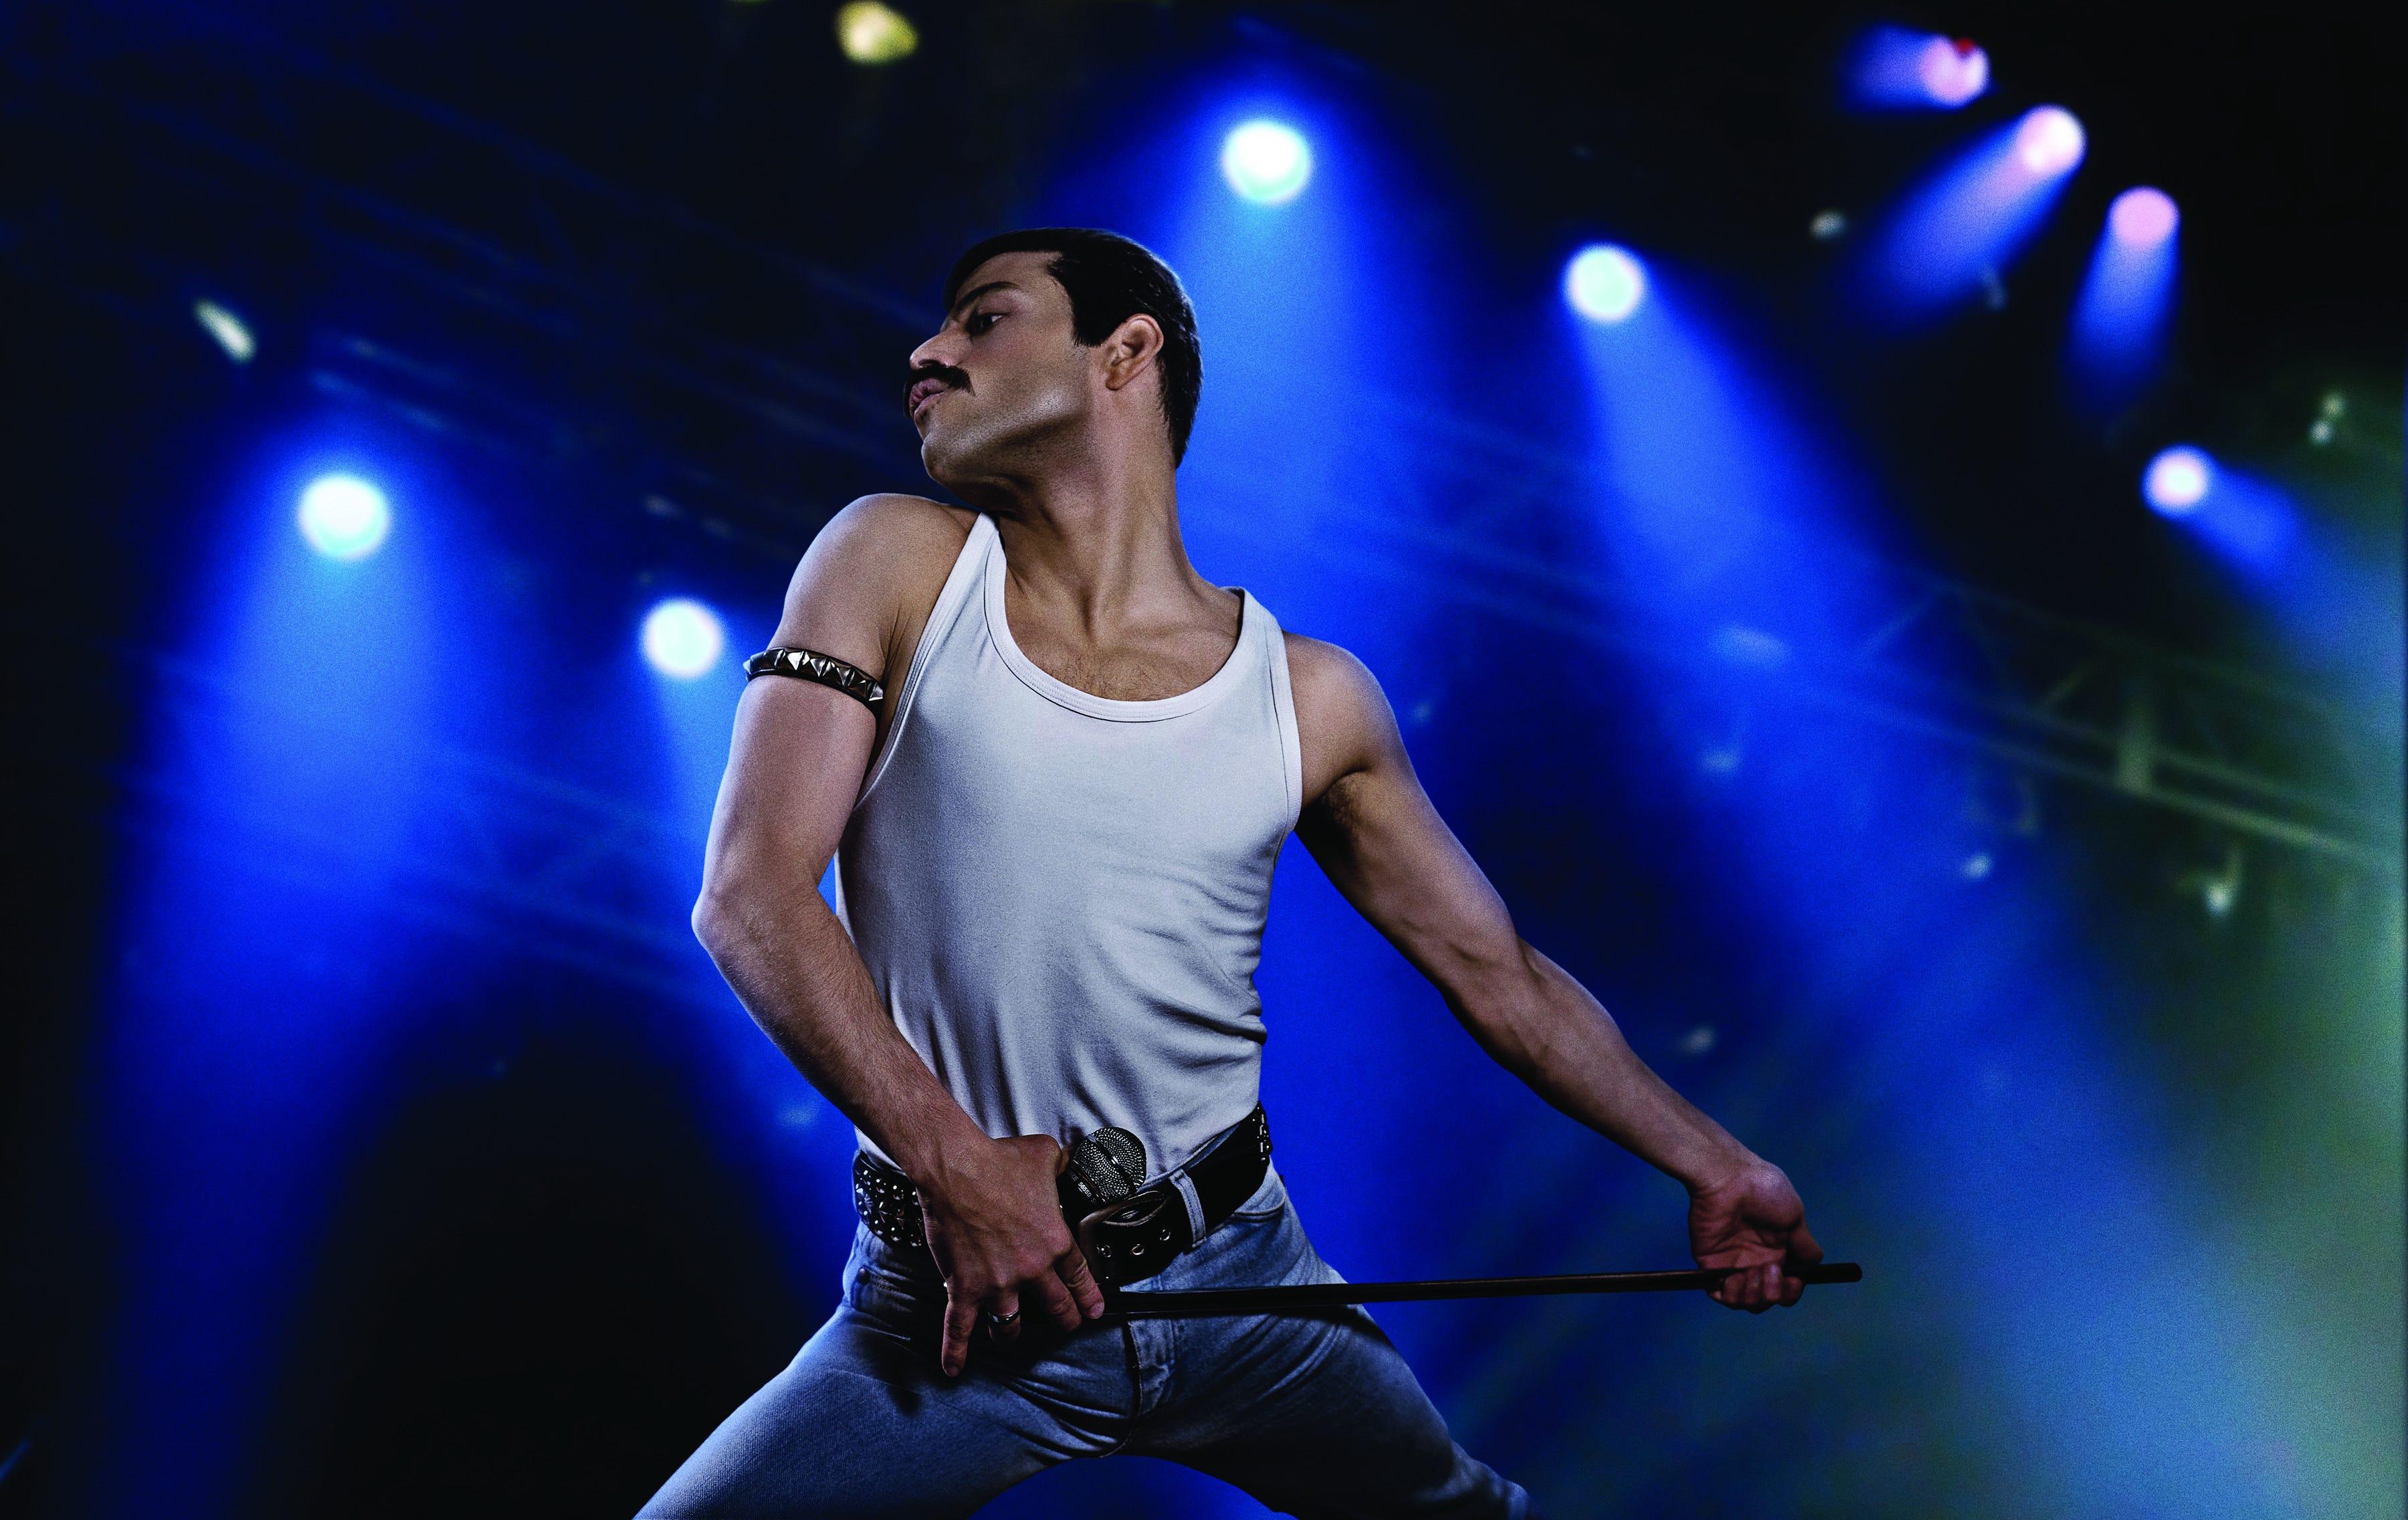 Rami Malek stars as rock icon Freddie Mercury in